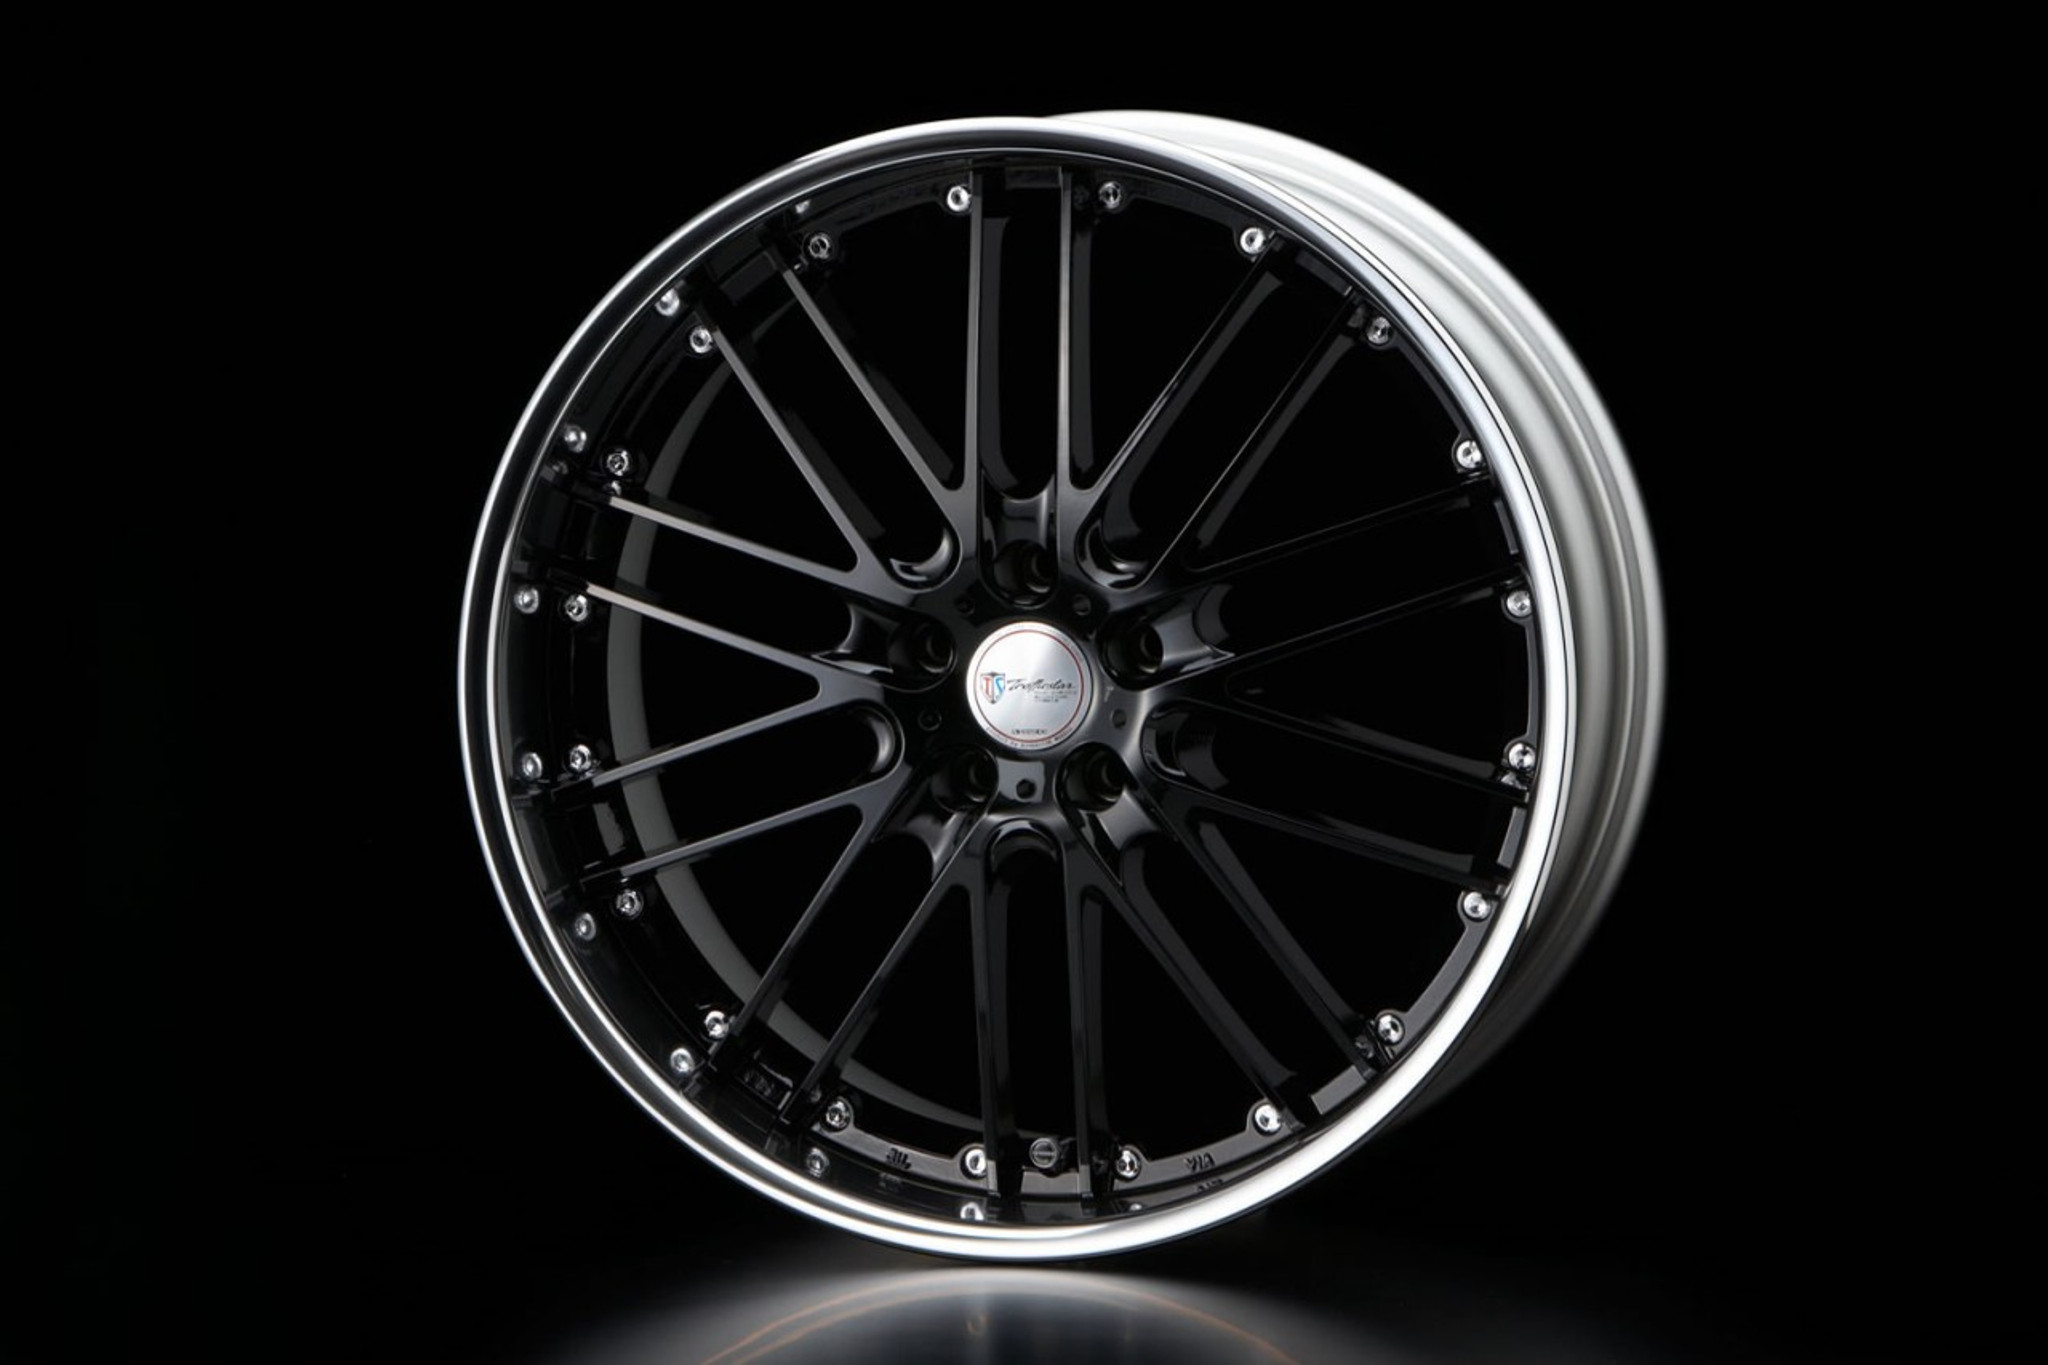 Trafficstar Rtm Alloy Wheels Meduza Design Ltd